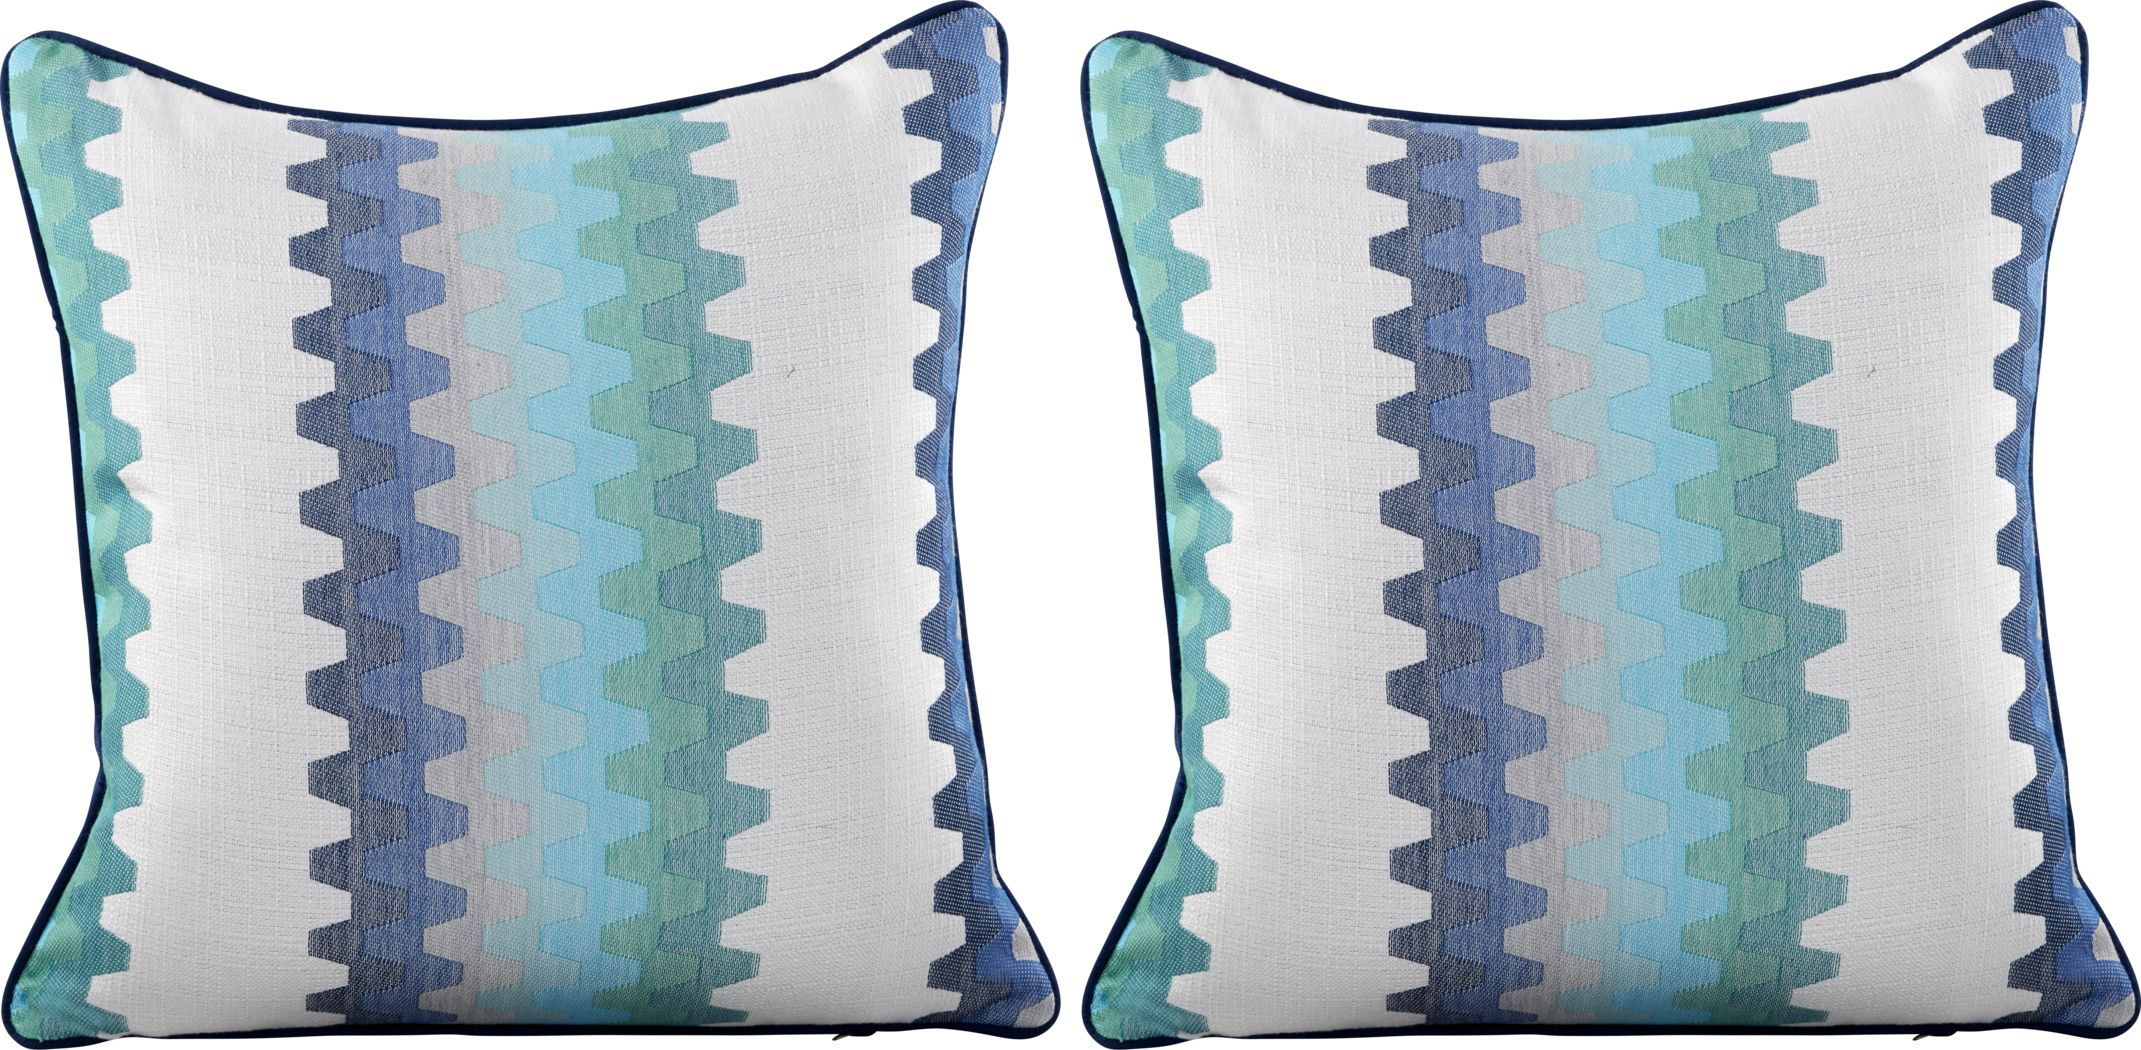 Accordion Geo Seaport Indoor/Outdoor Accent Pillow, Set of Two